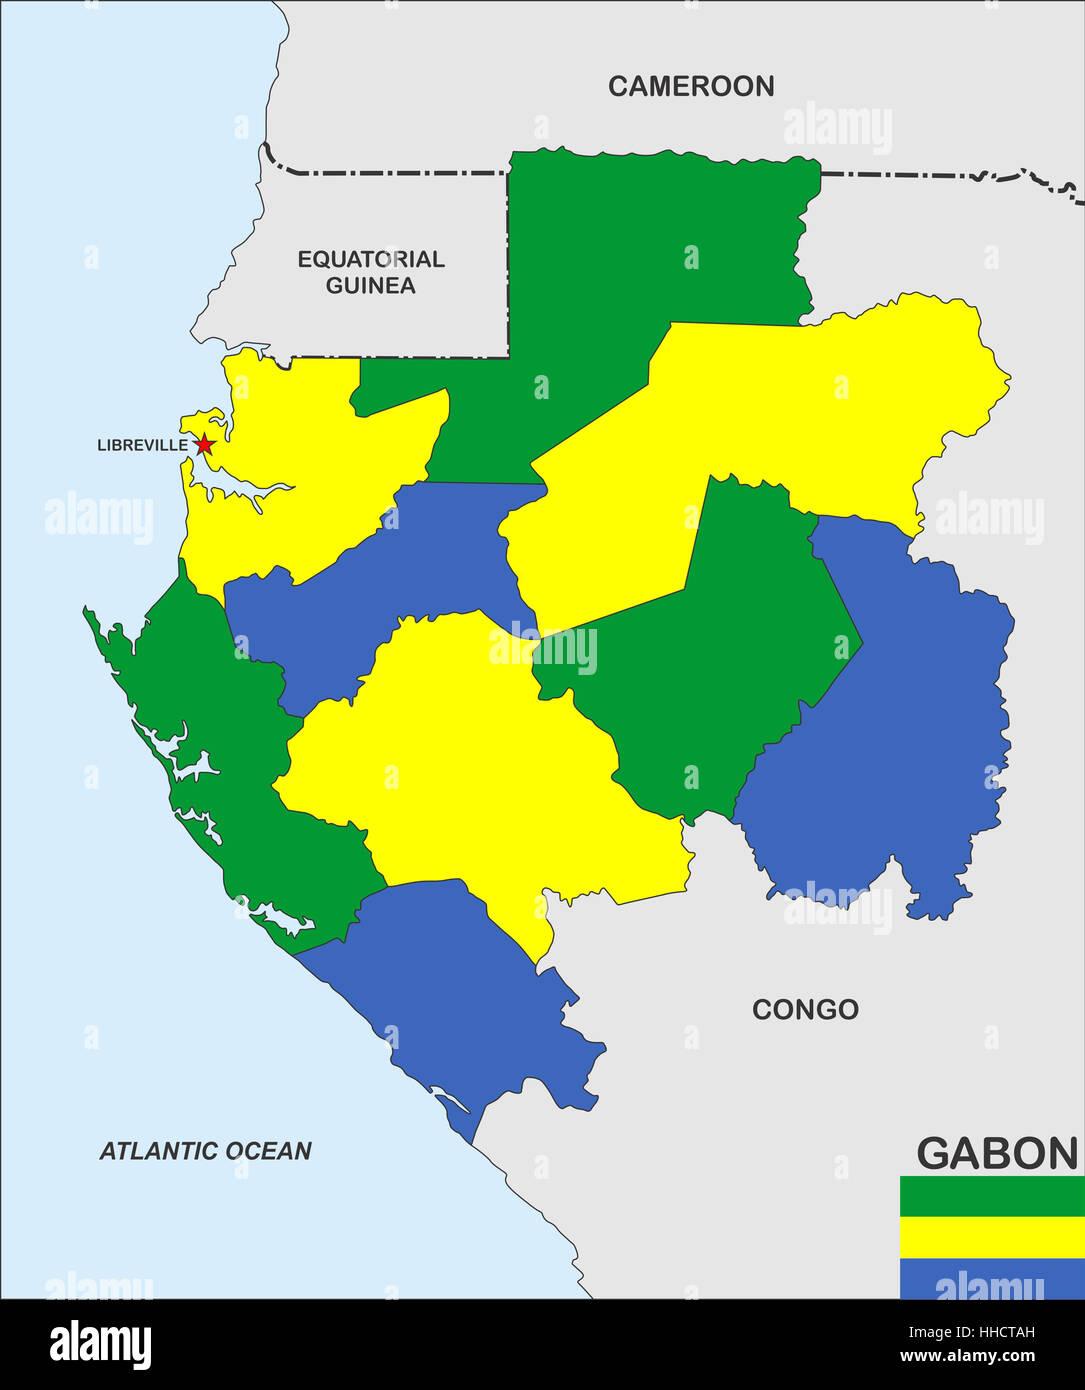 Very Big Size Gabon Country Political Map Stock Photo Royalty - Gabon map